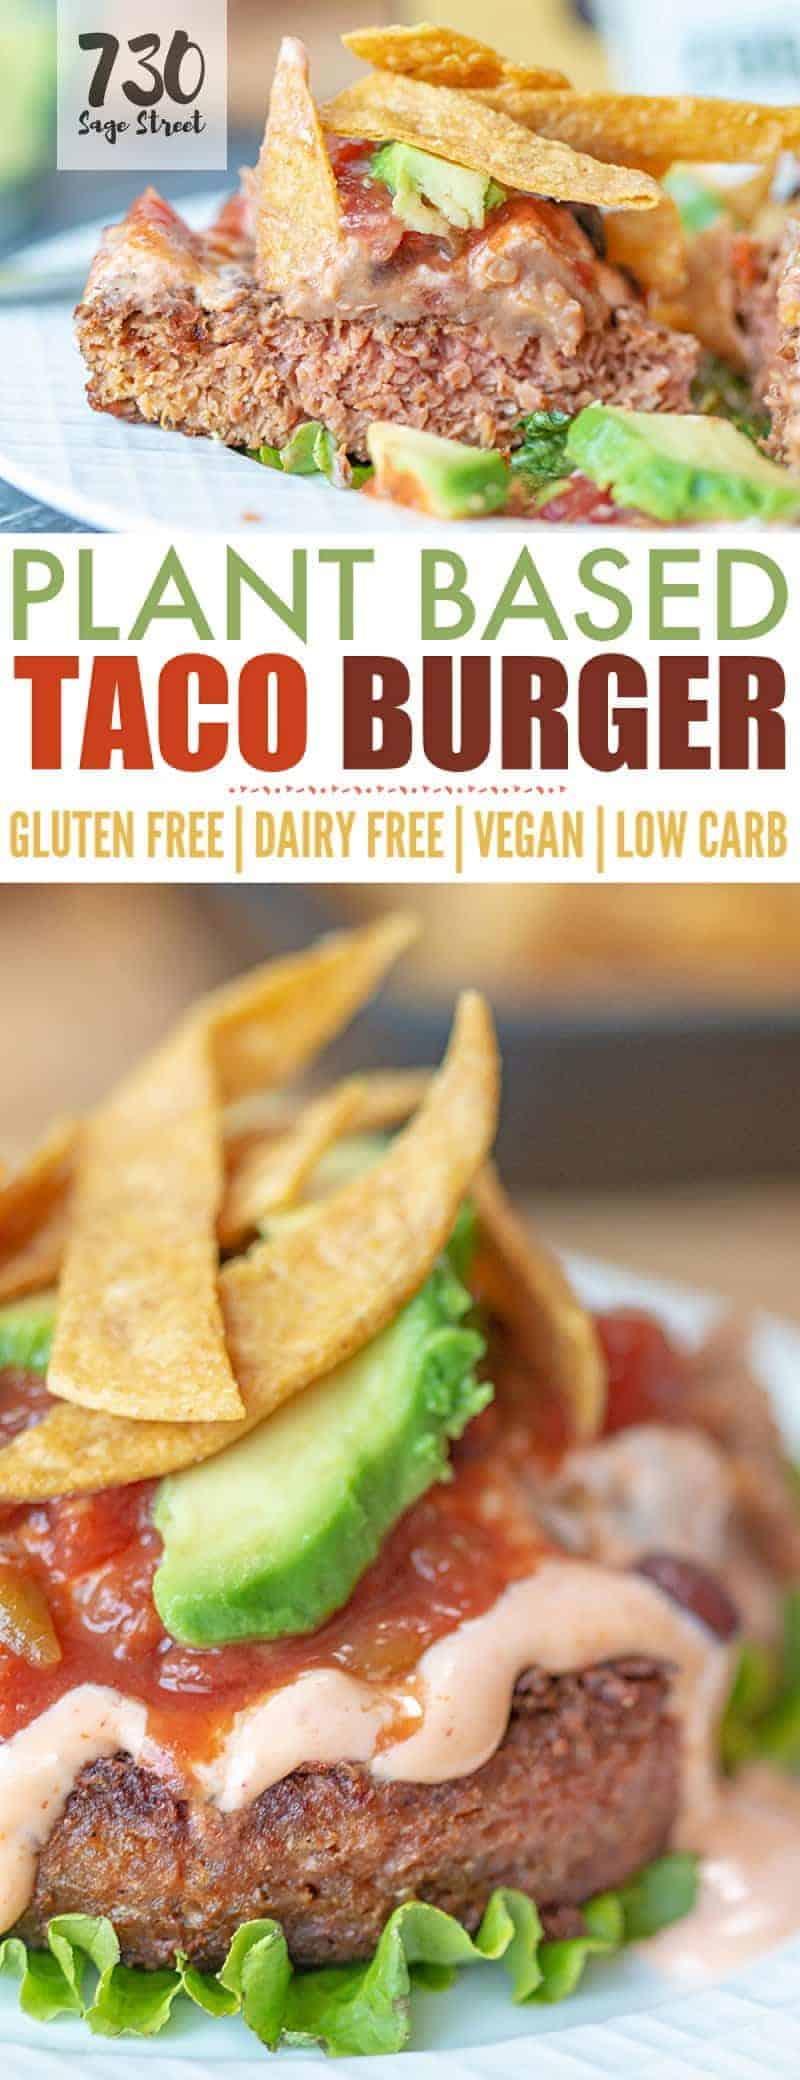 taco burger photo collage